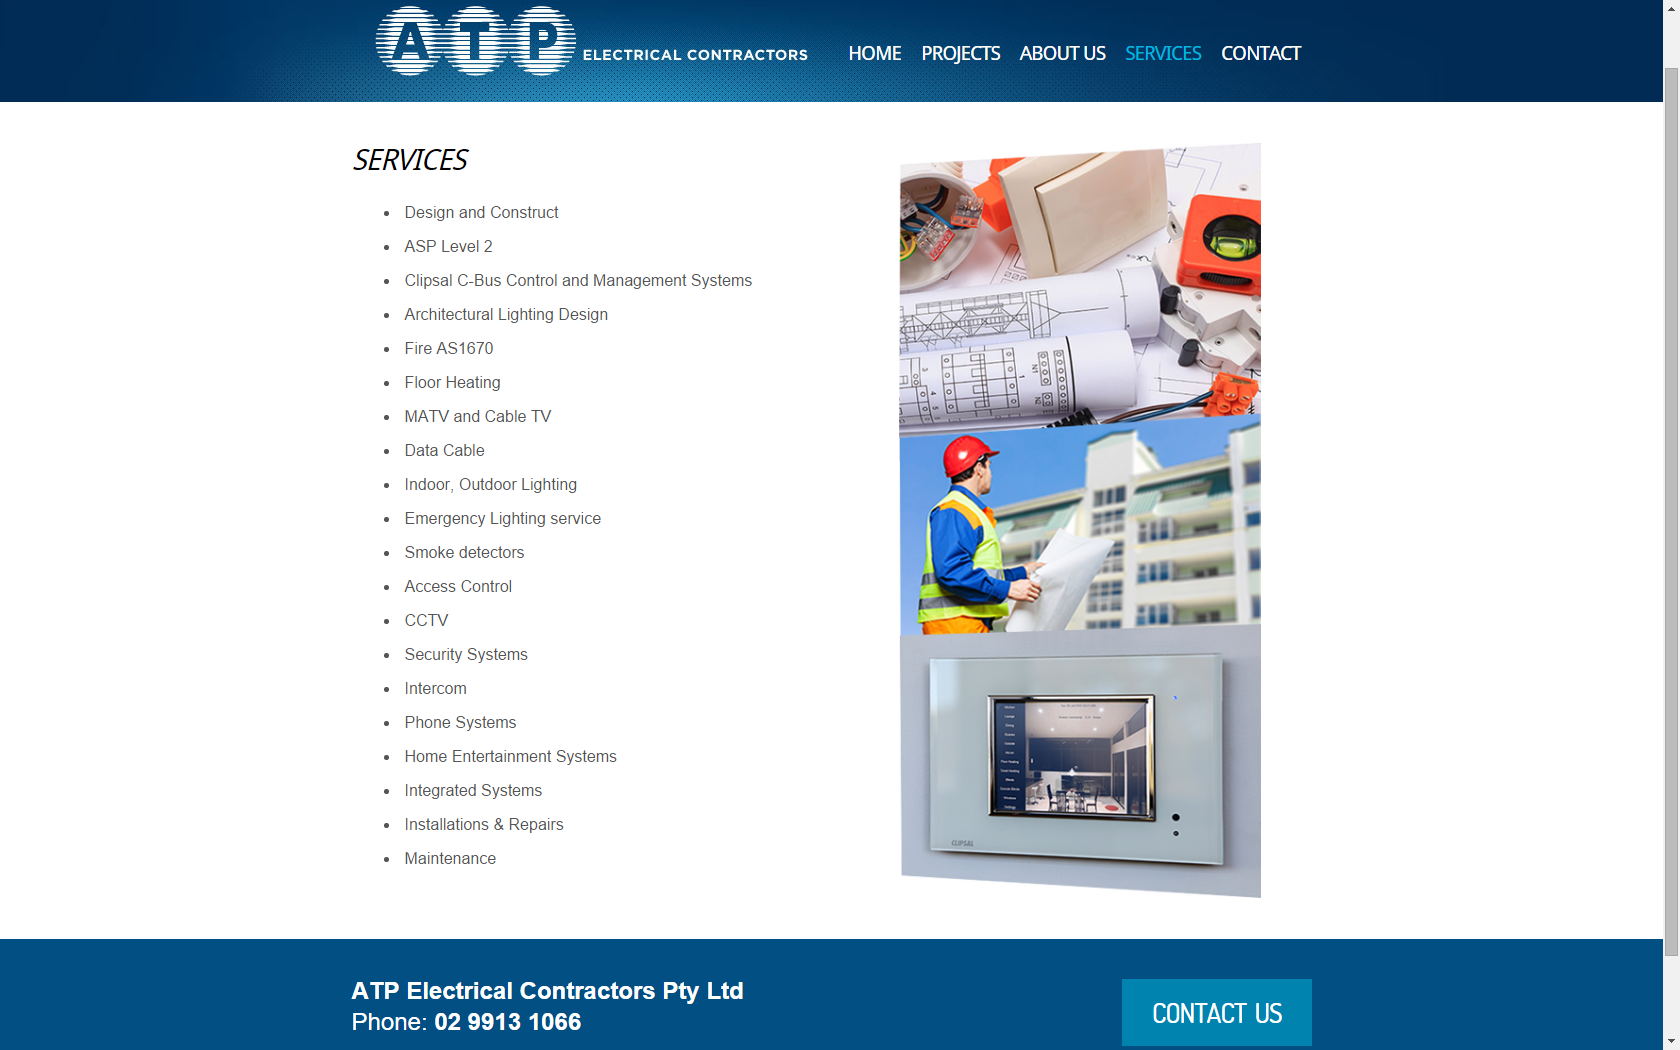 ATP Electrical